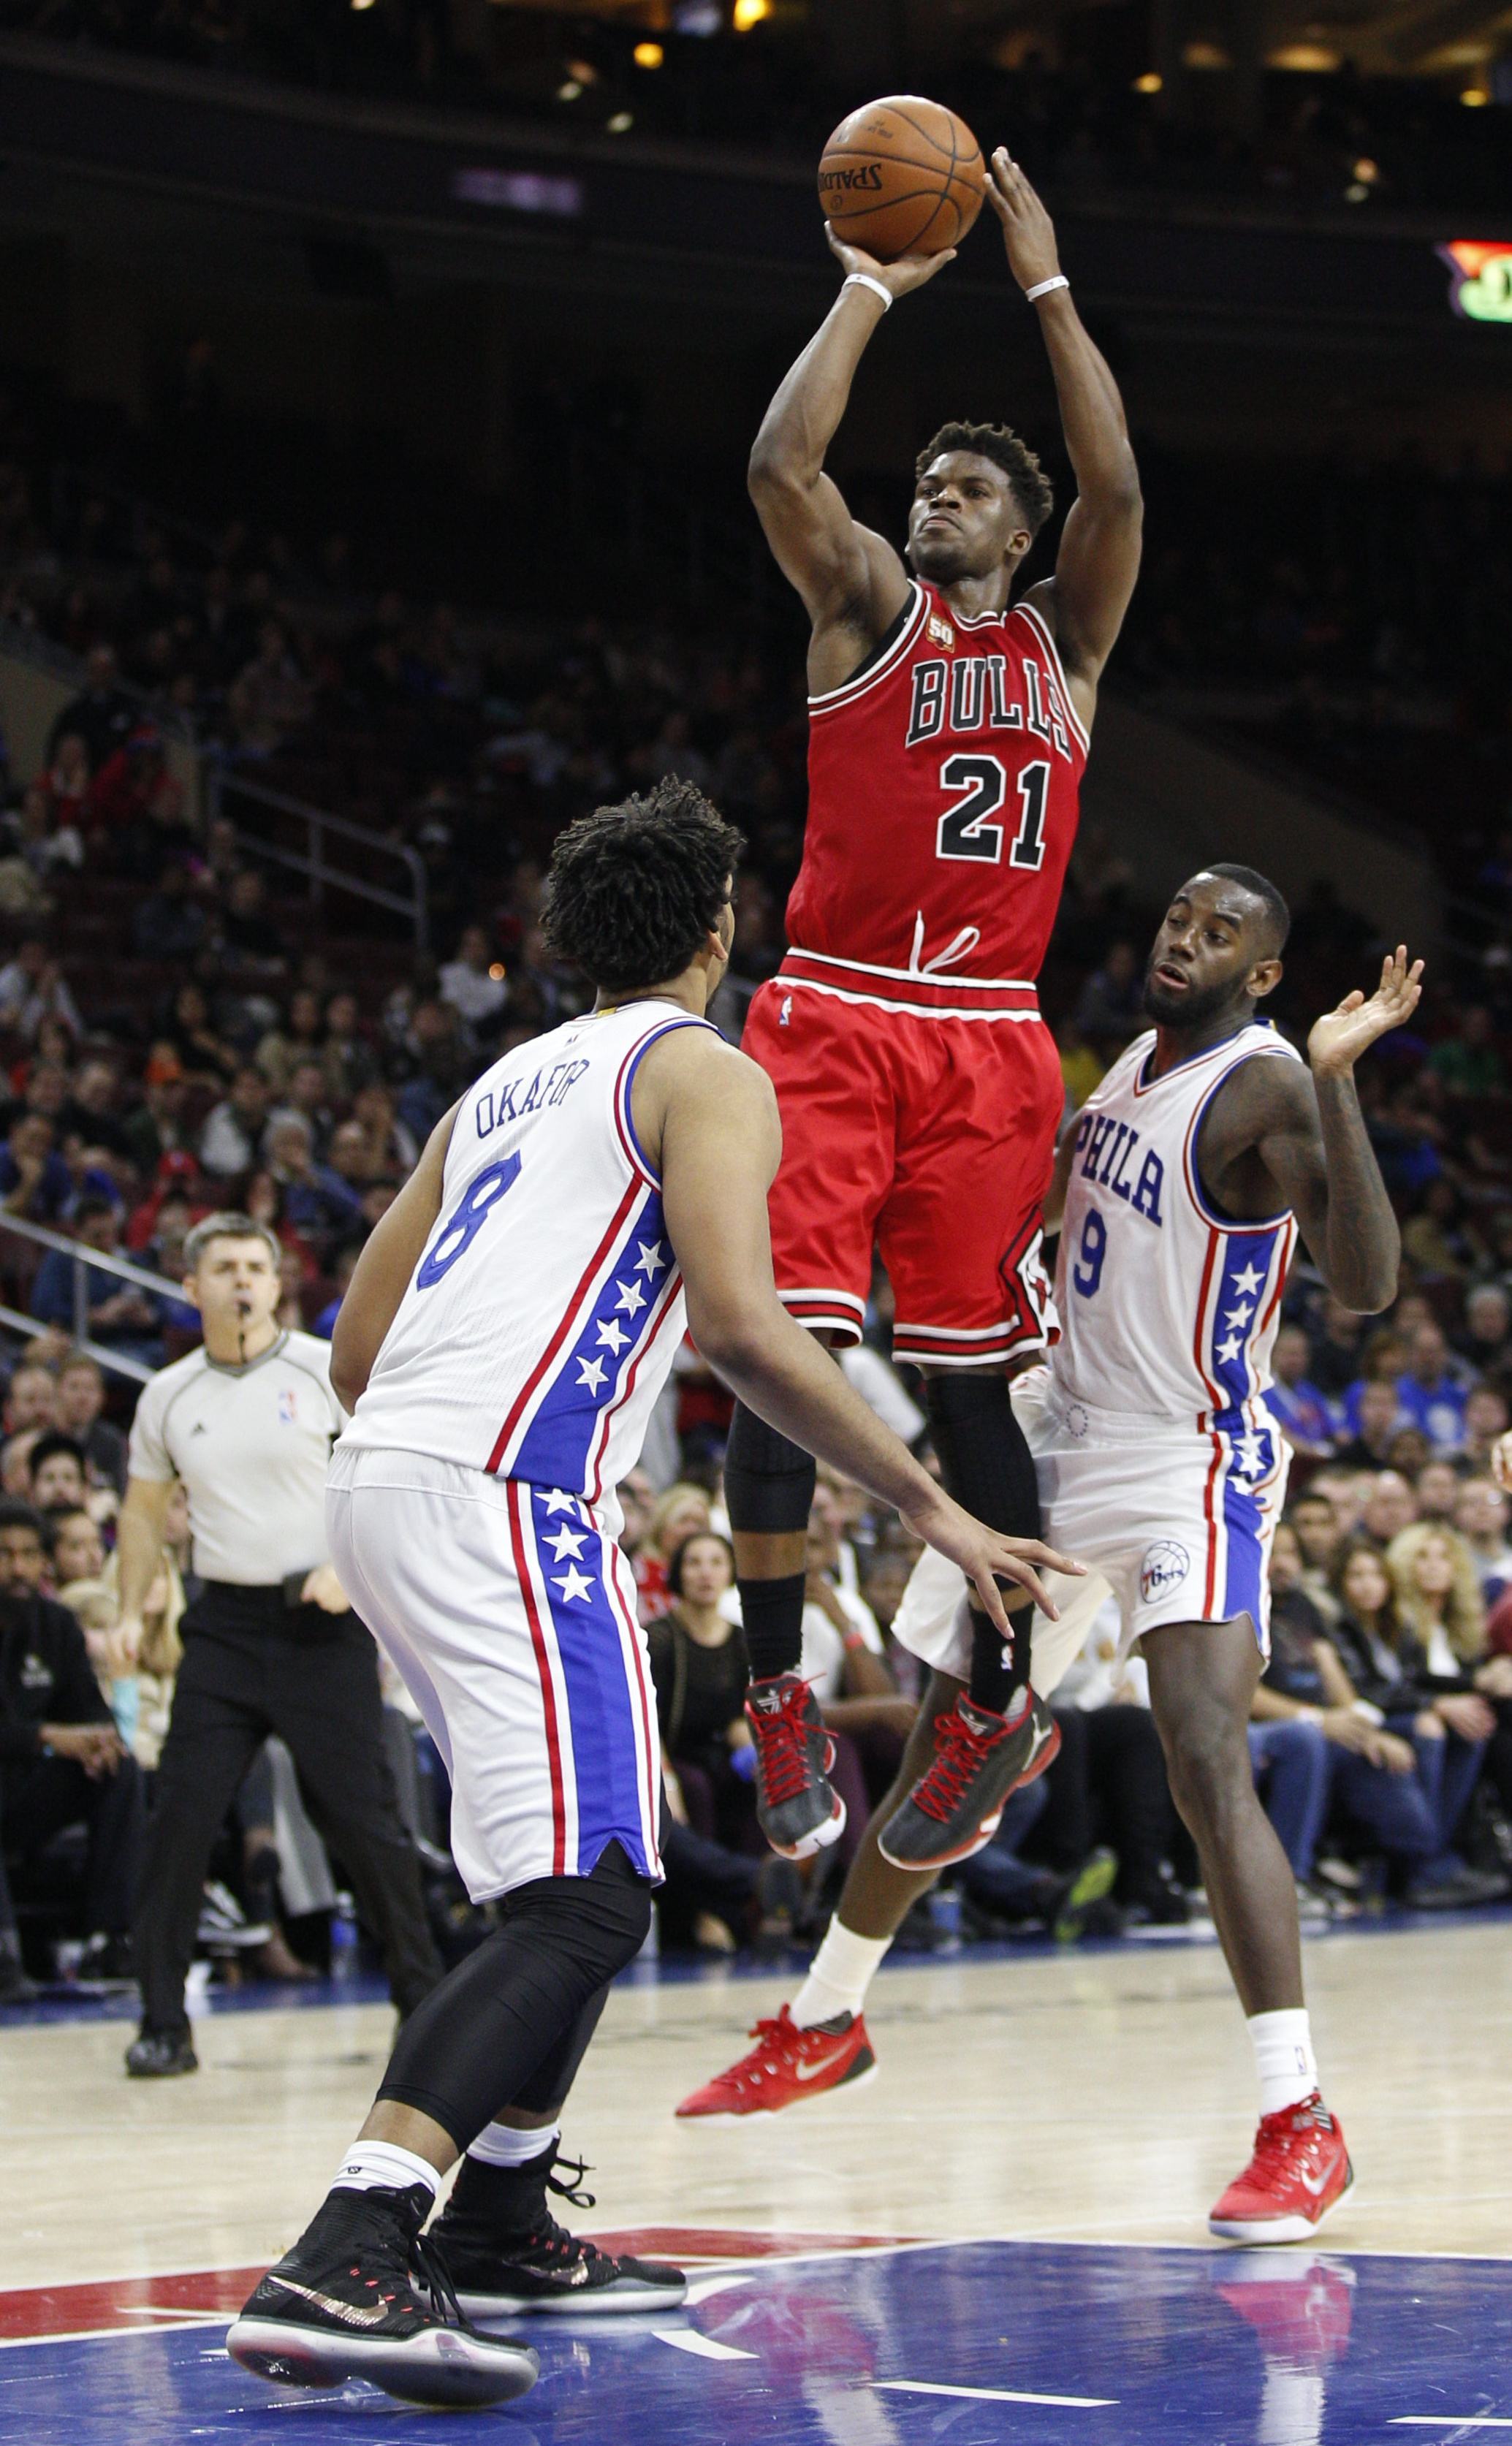 Chicago Bulls' Jimmy Butler is fouled by Philadelphia 76ers' JaKarr Sampson, right, as 76ers' Jahlil Okafor helps defend during the second half of an NBA basketball game Thursday, Jan. 14, 2016, in Philadelphia. The Bulls won 115-111 in overtime. (AP Phot